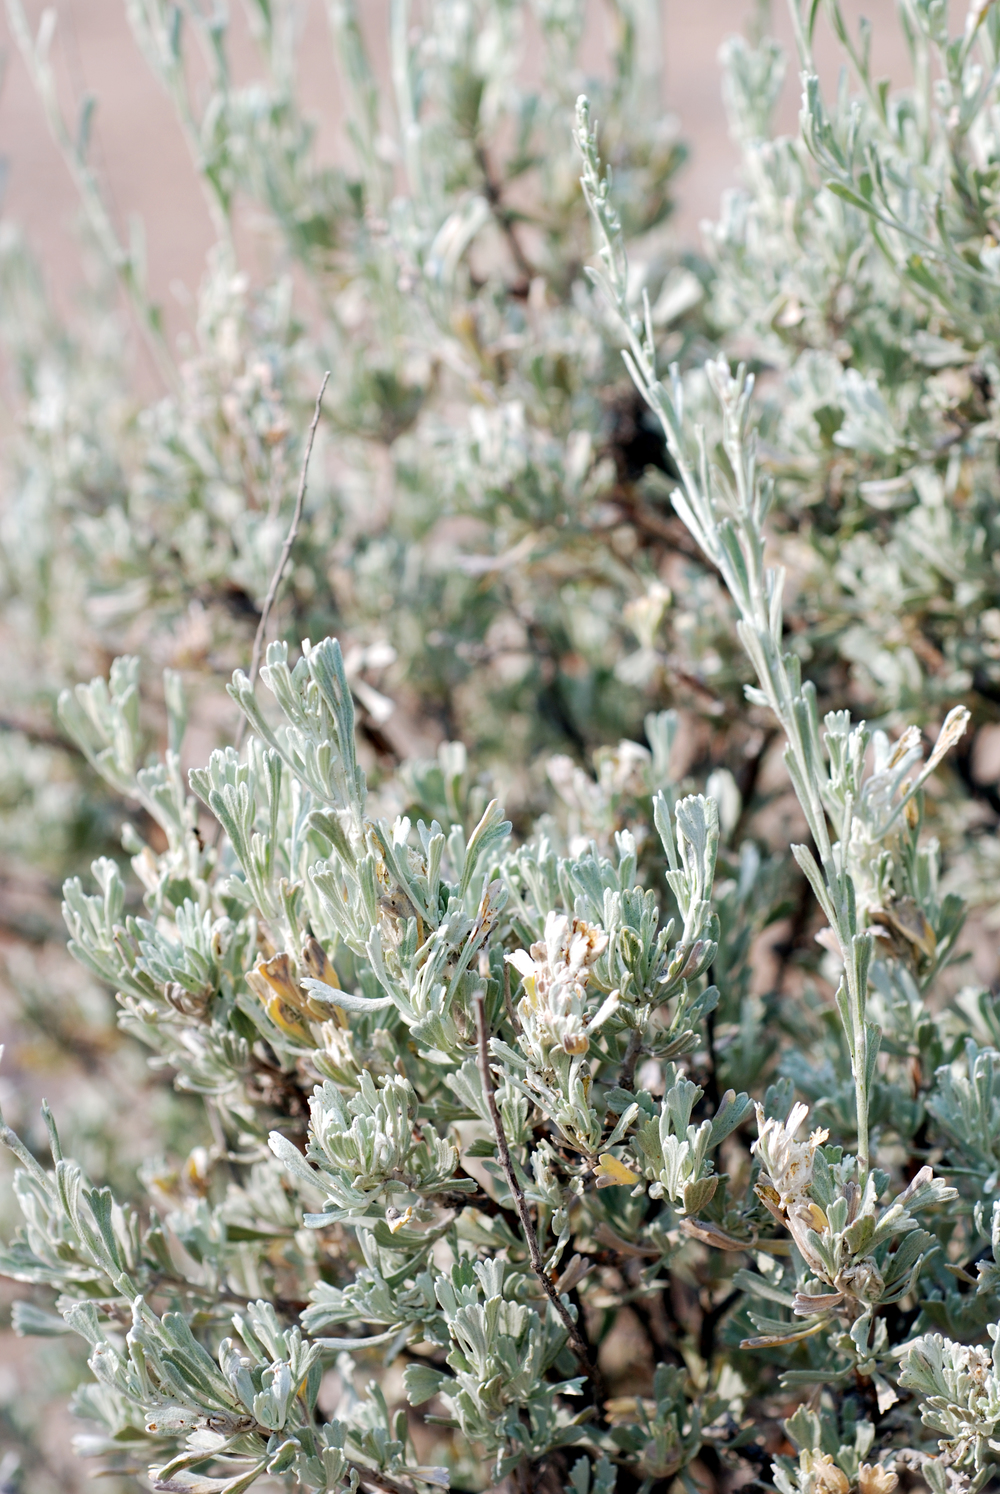 Basin big sagebrush (Artemisia tridentata ssp. tridentata).jpg